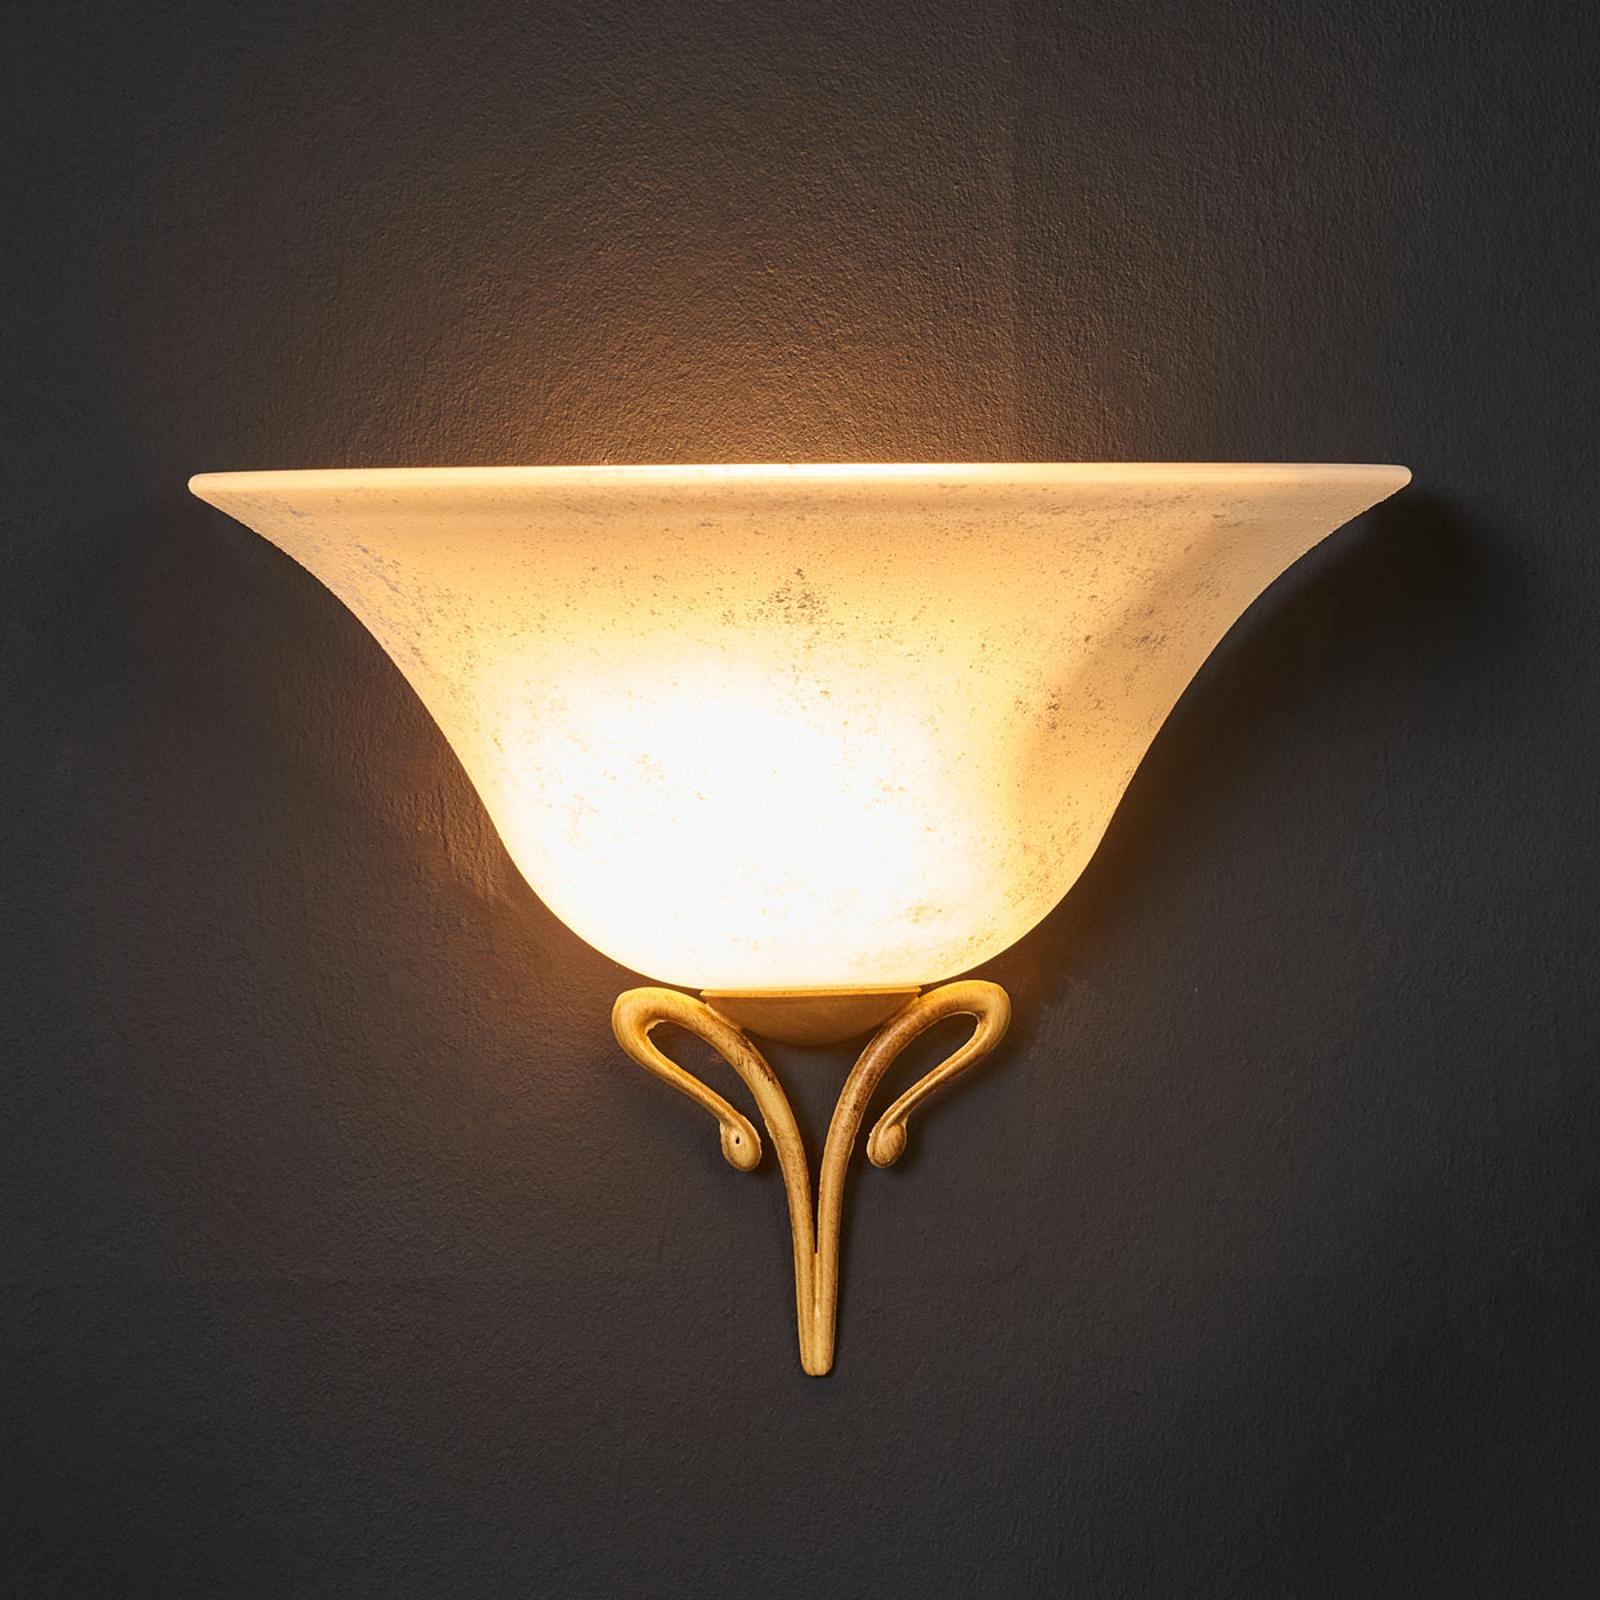 Stijlvolle wandlamp Antonio